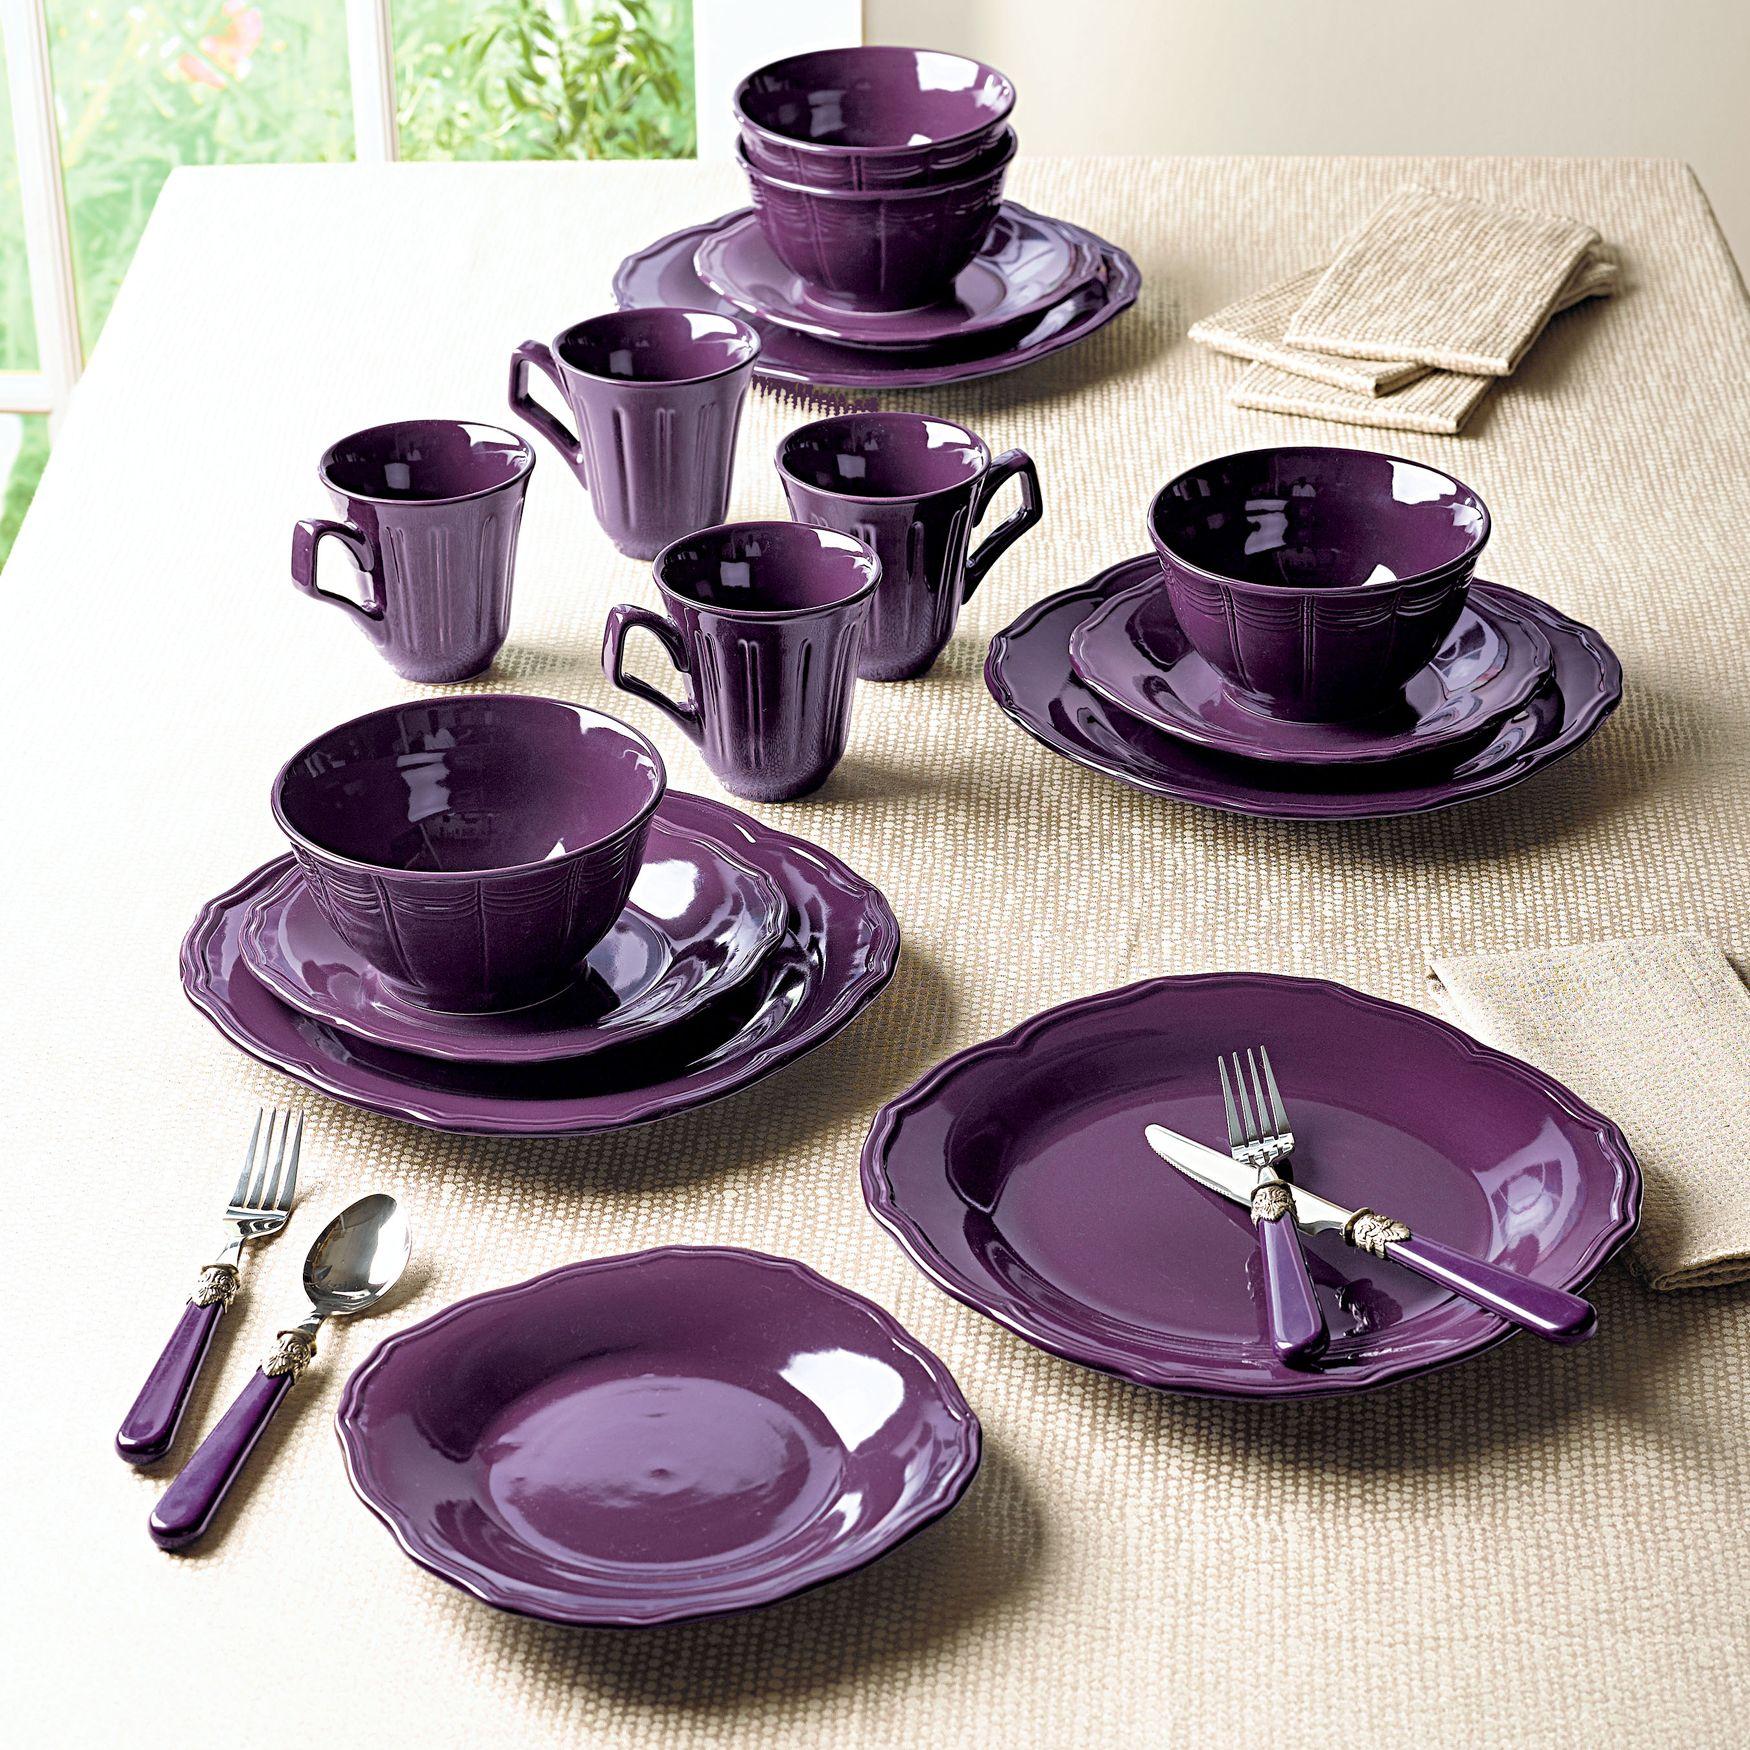 16-Pc Embossed Dinnerware Set | Dinnerware & Flatware ...